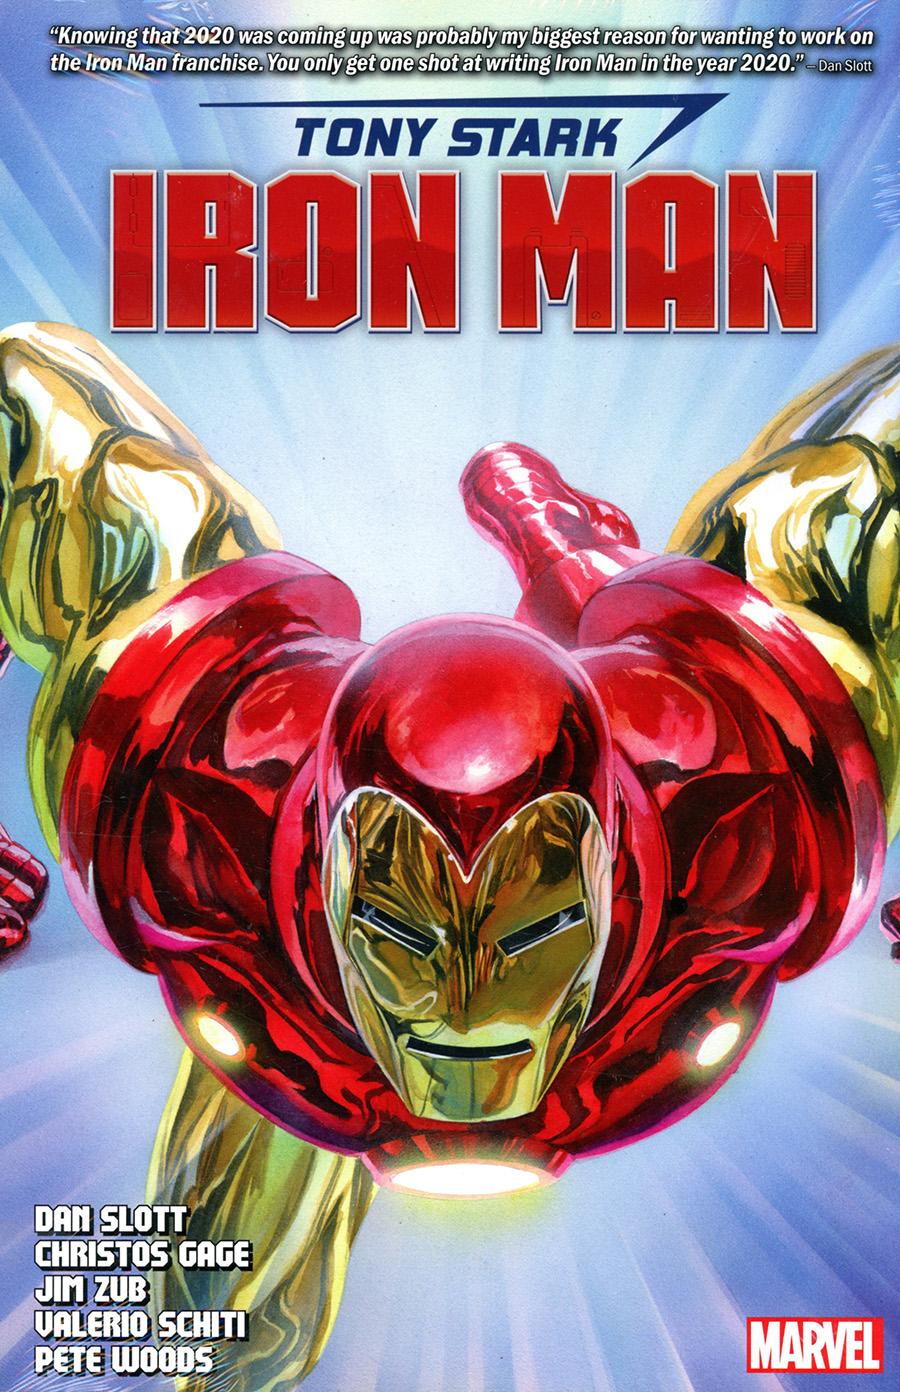 Tony Stark Iron Man By Dan Slott Omnibus HC Direct Market Alex Ross Variant Cover